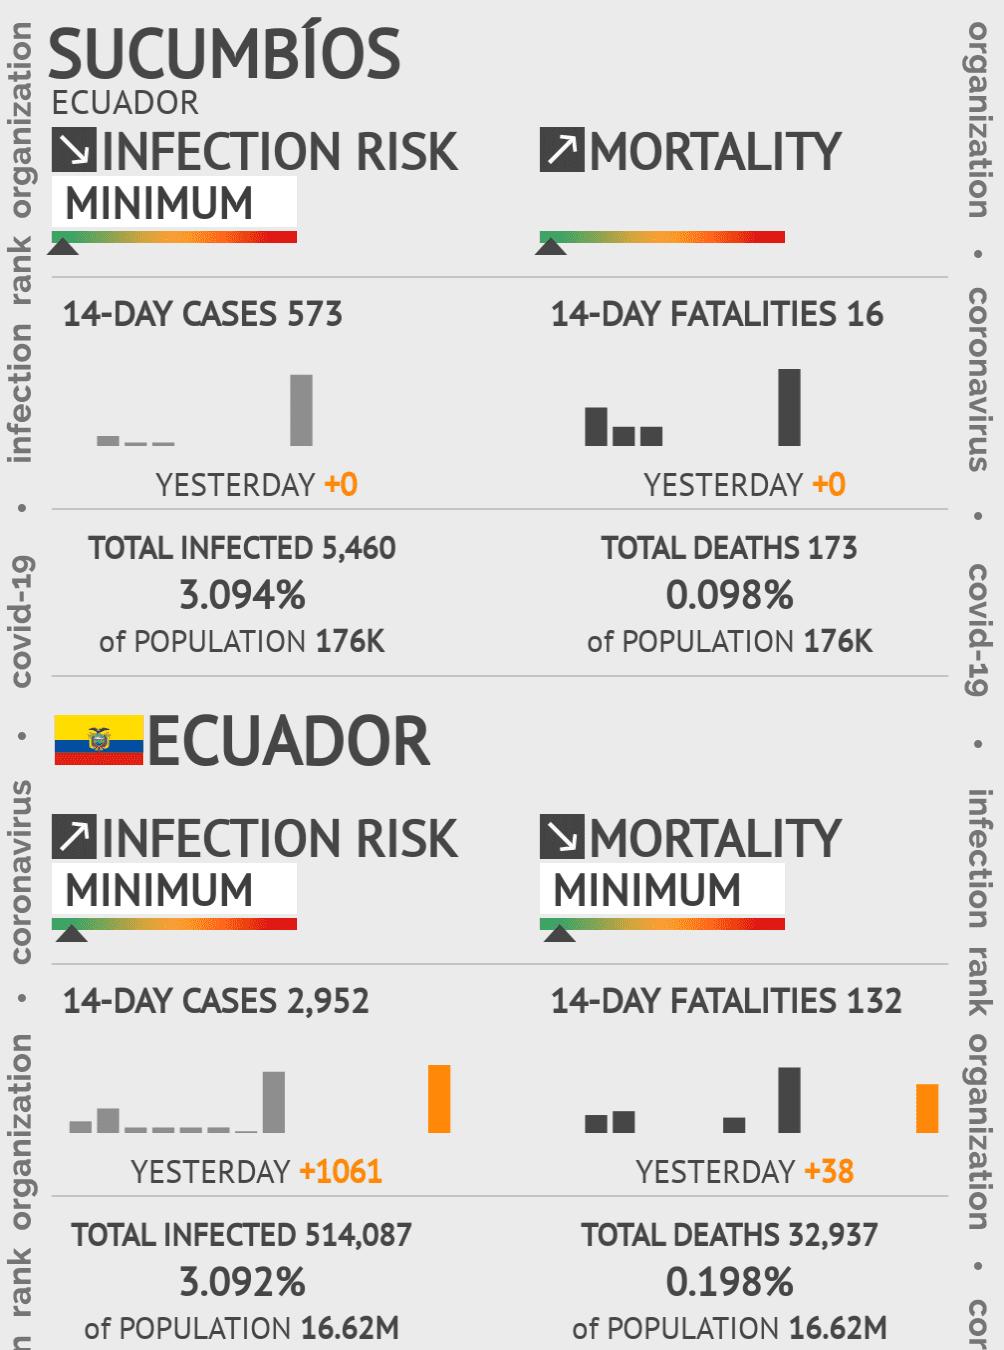 Sucumbíos Coronavirus Covid-19 Risk of Infection on March 07, 2021